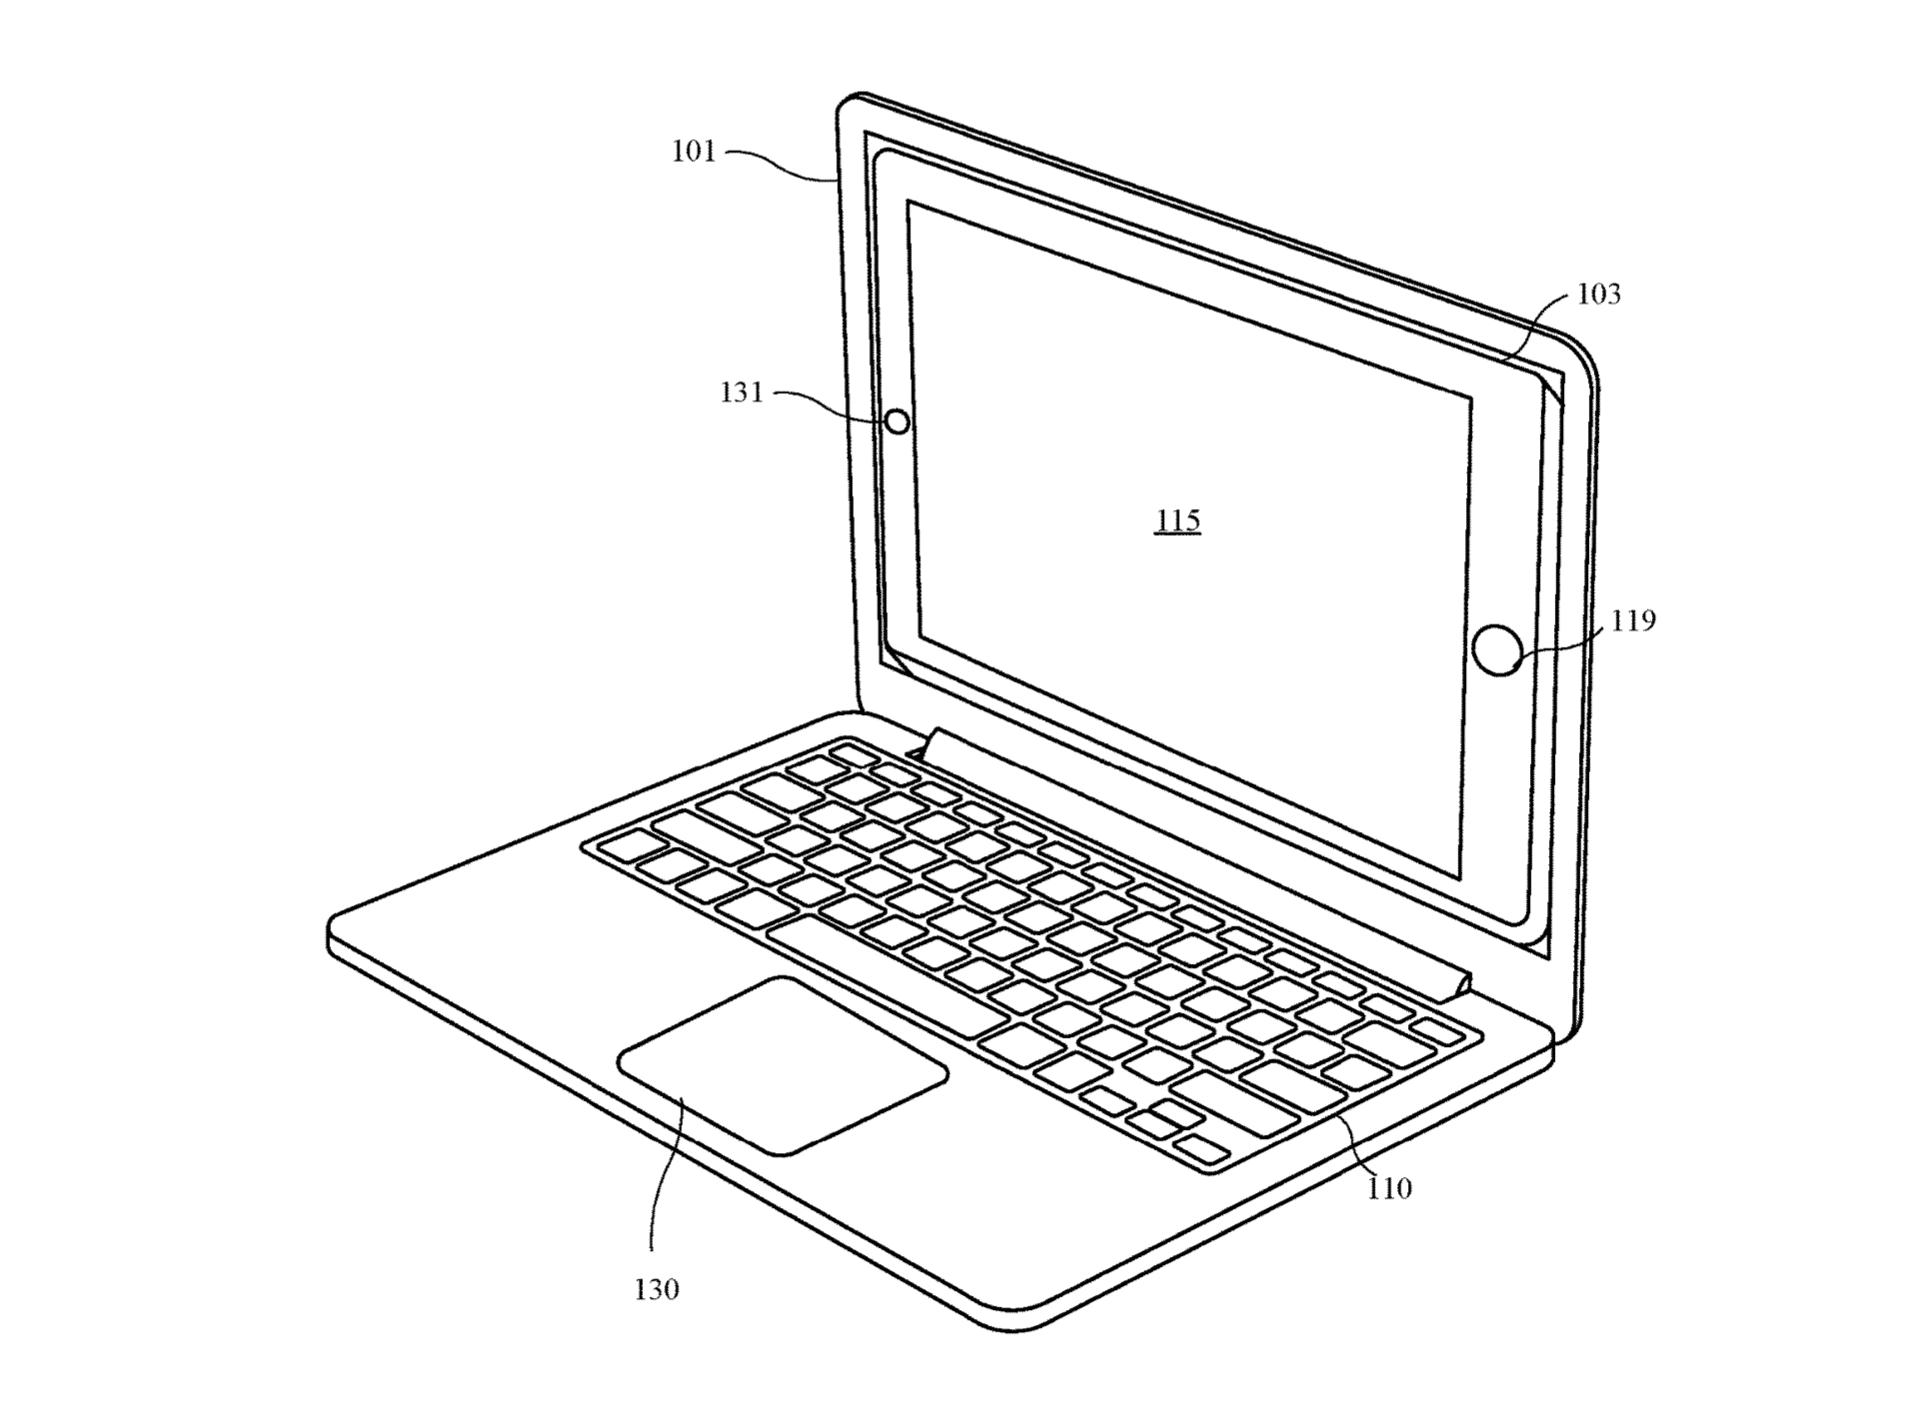 iPad-Accessoire